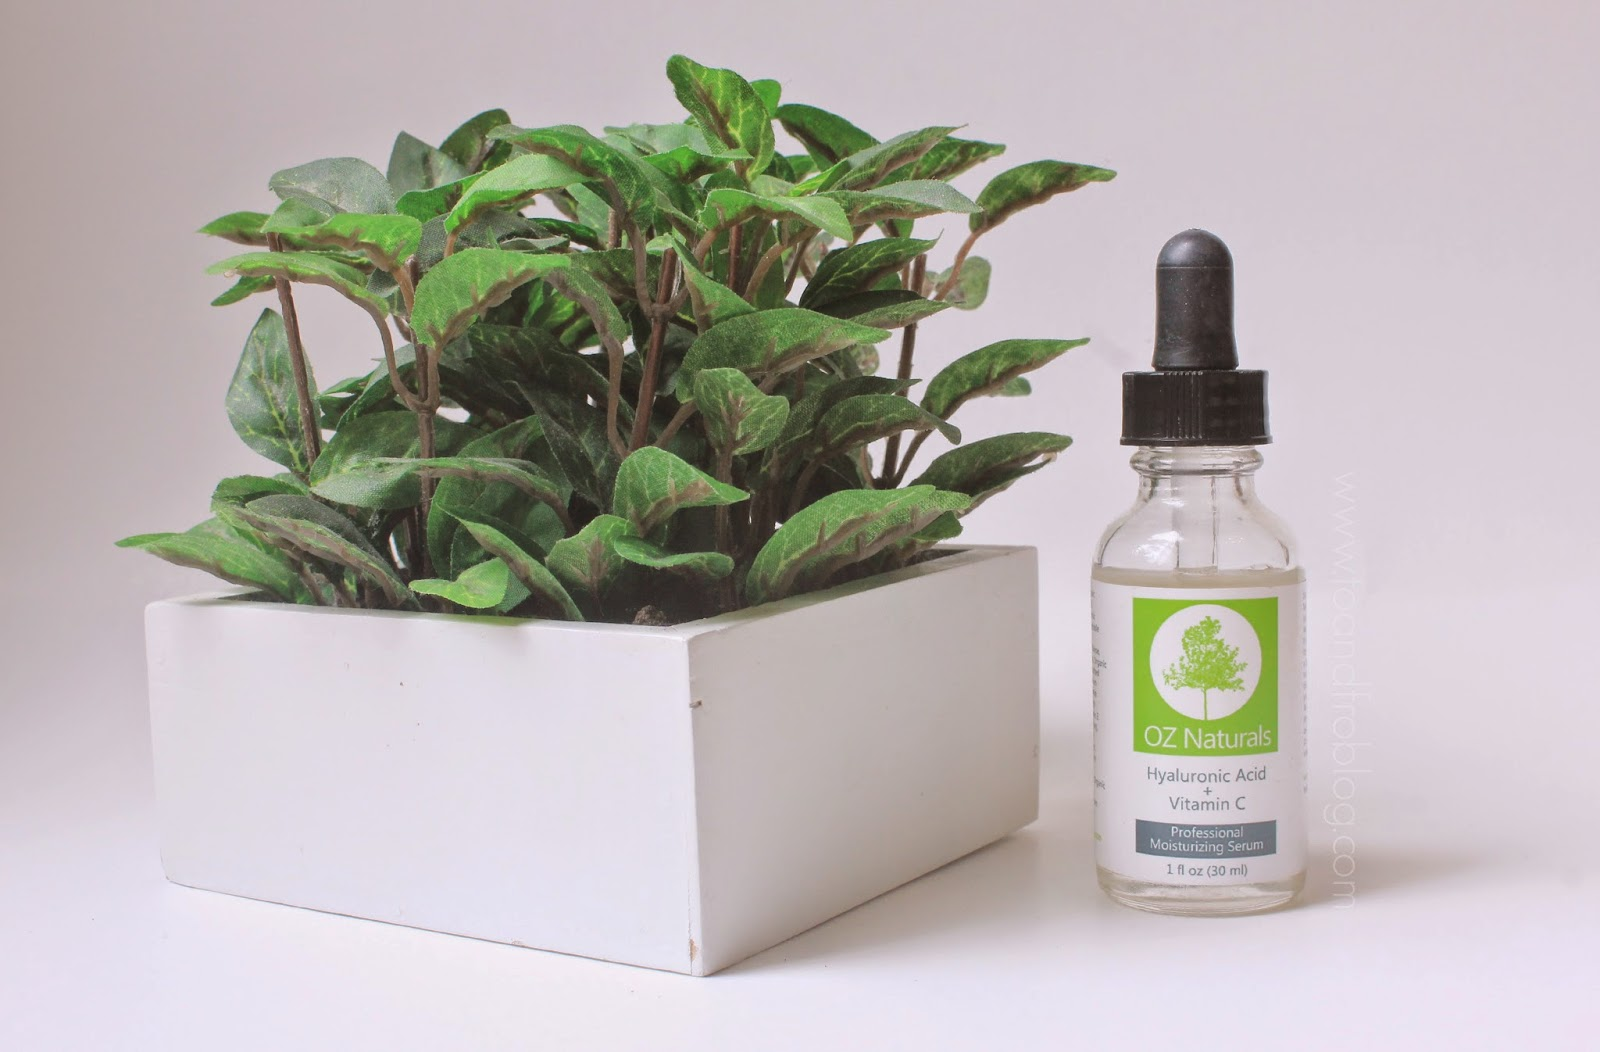 oz naturals hyaluronic serum